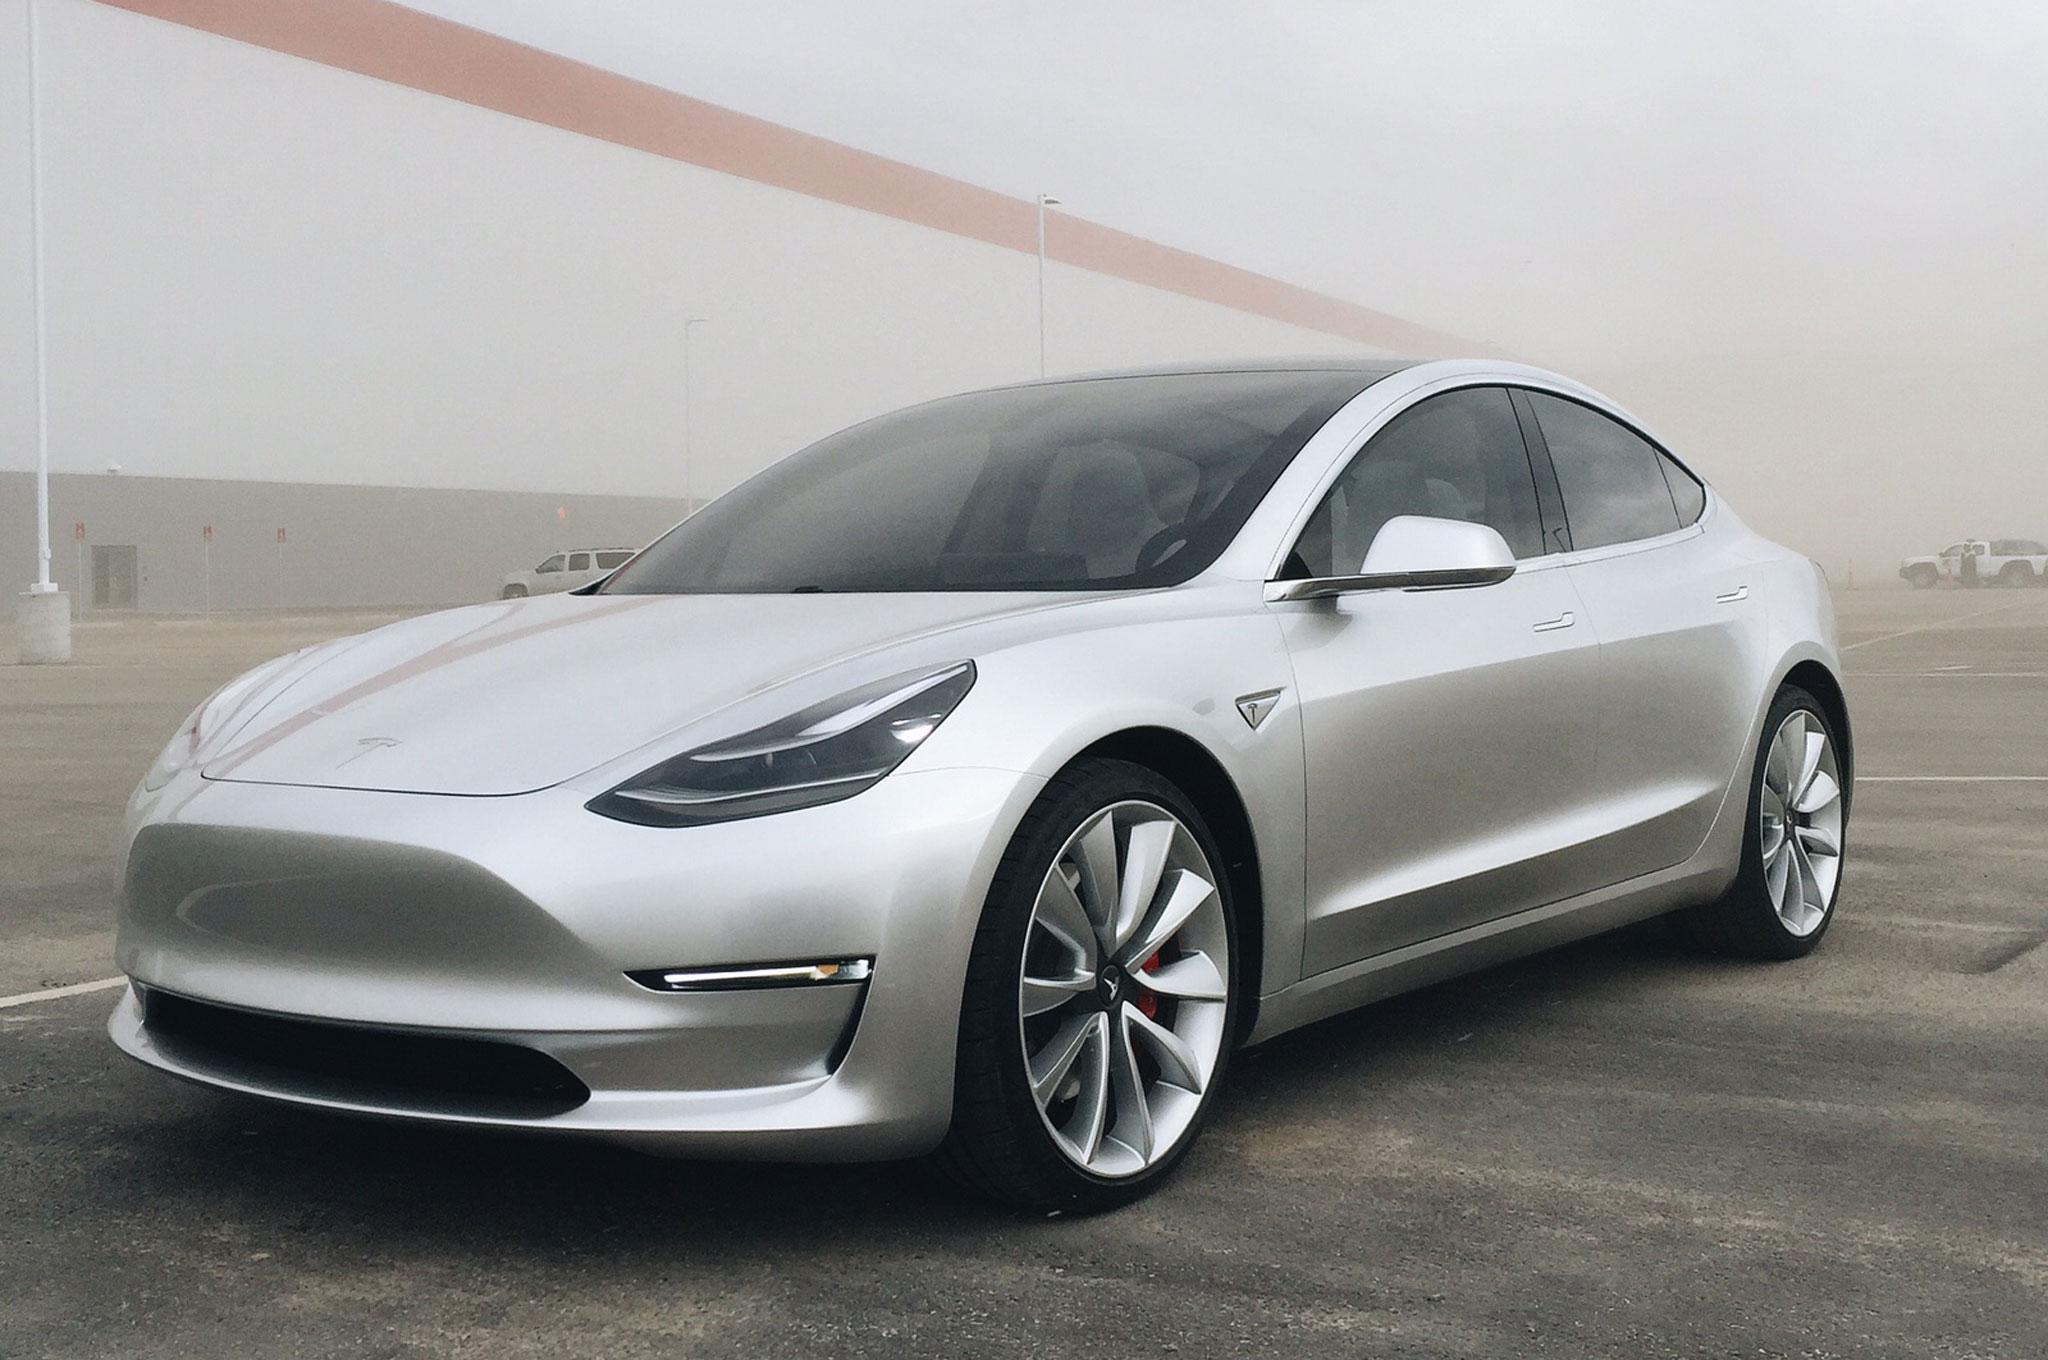 future of electric cars in pakistan tesla model 3. Black Bedroom Furniture Sets. Home Design Ideas